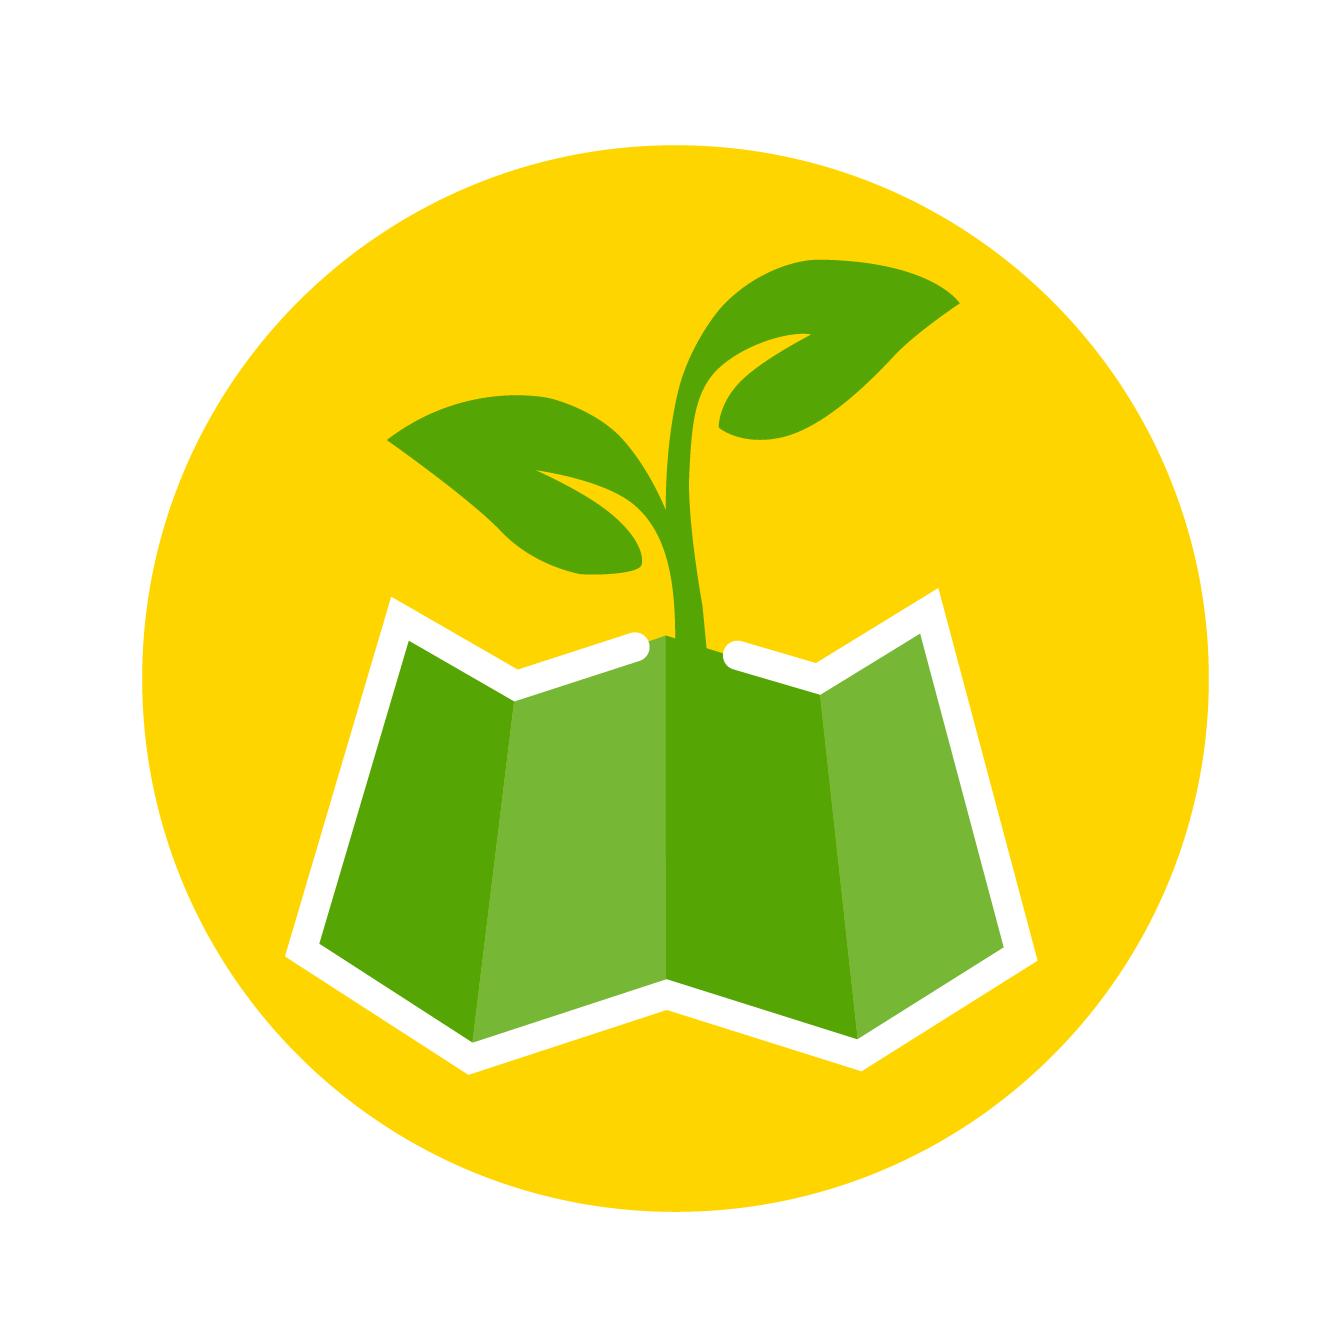 Mapseed logo